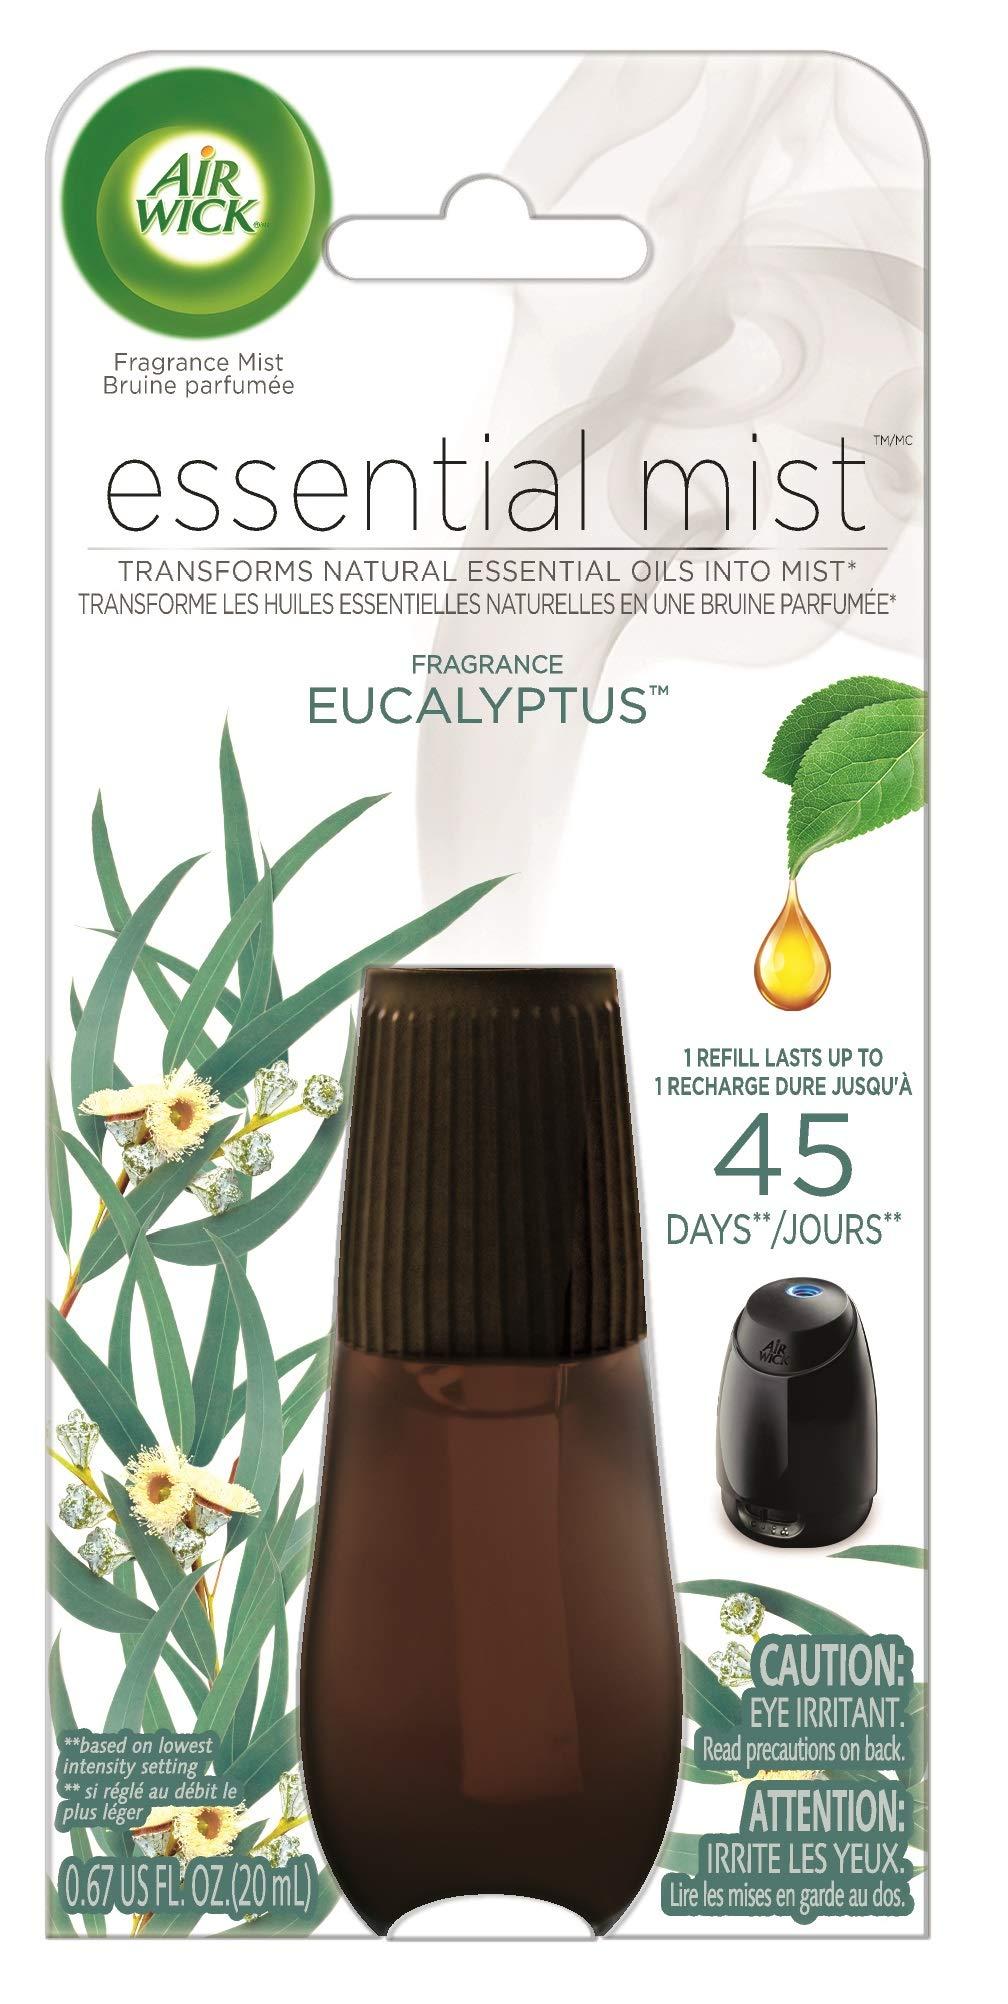 Air Wick Essential Mist, Essential Oil Diffuser Refill, Eucalyptus, 1ct, Air Freshener